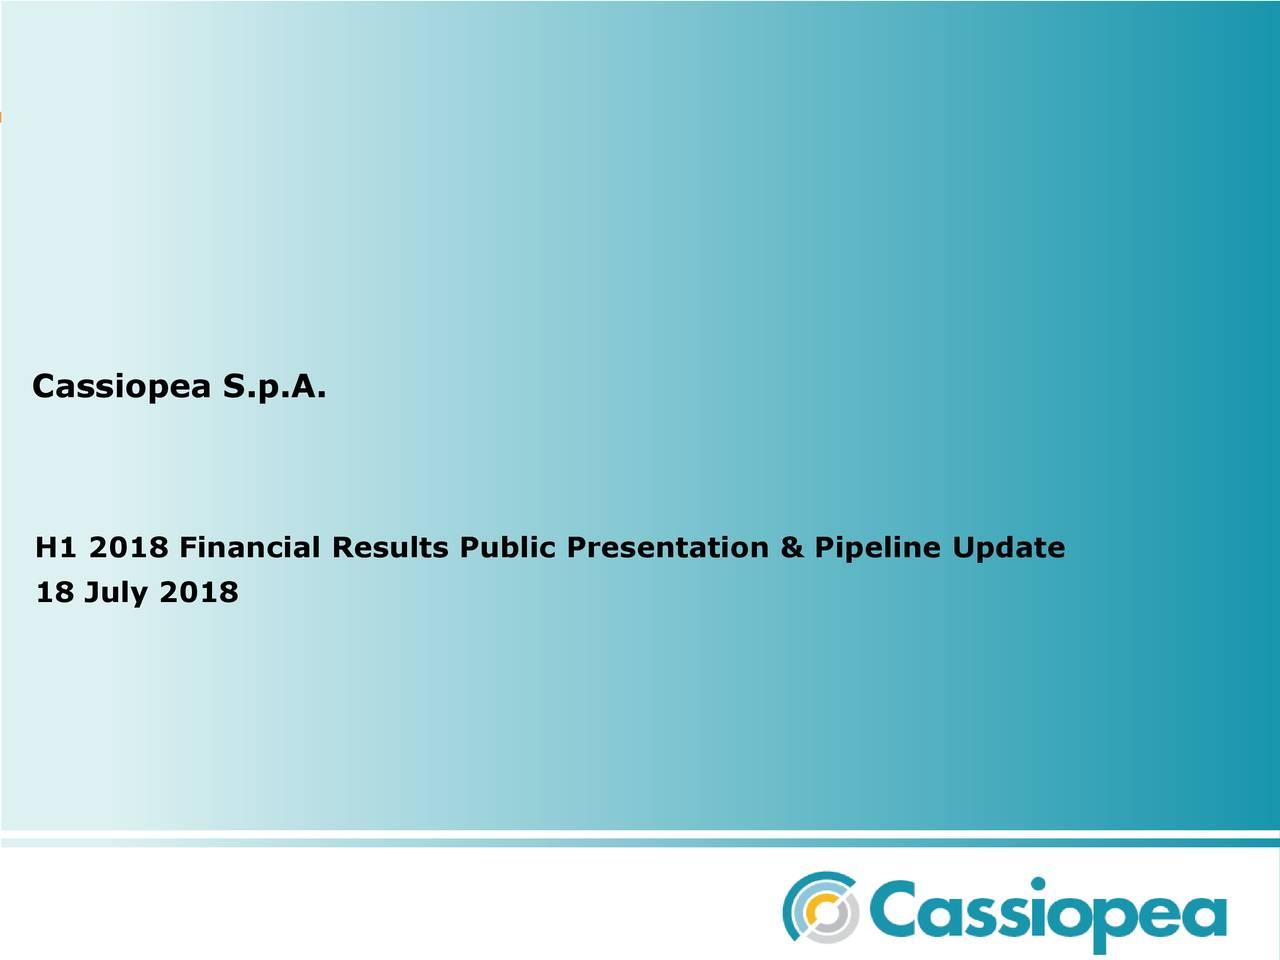 H1 2018 Financial Results Public Presentation & Pipeline Update 18 July 2018